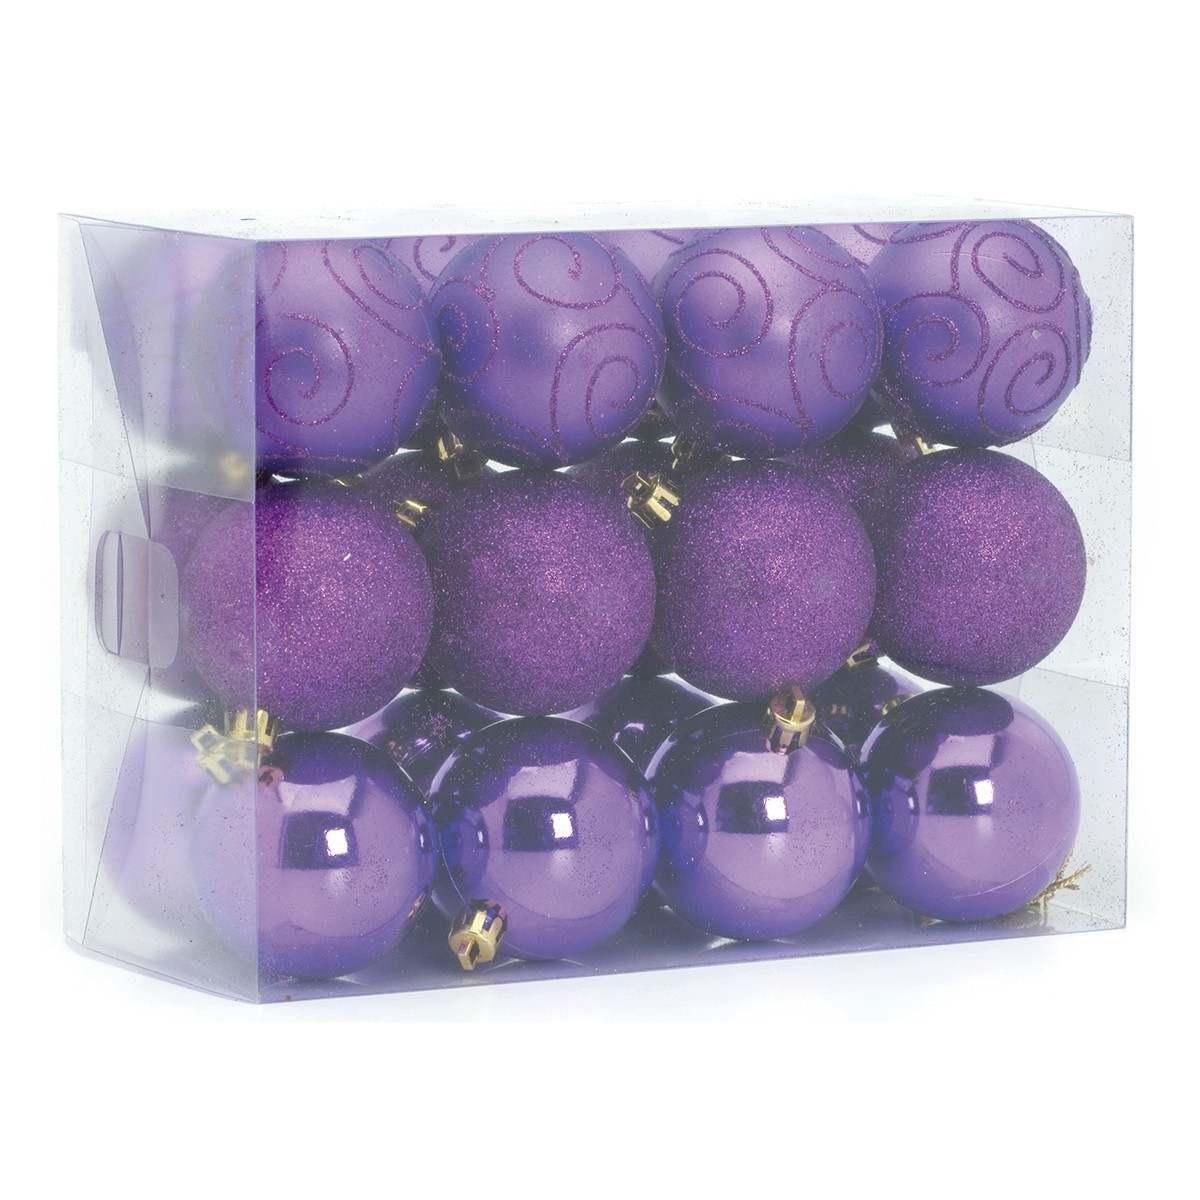 24 x 60mm Assorted Matt Glitter Shiny Regal Purple Shatterproof Baubles